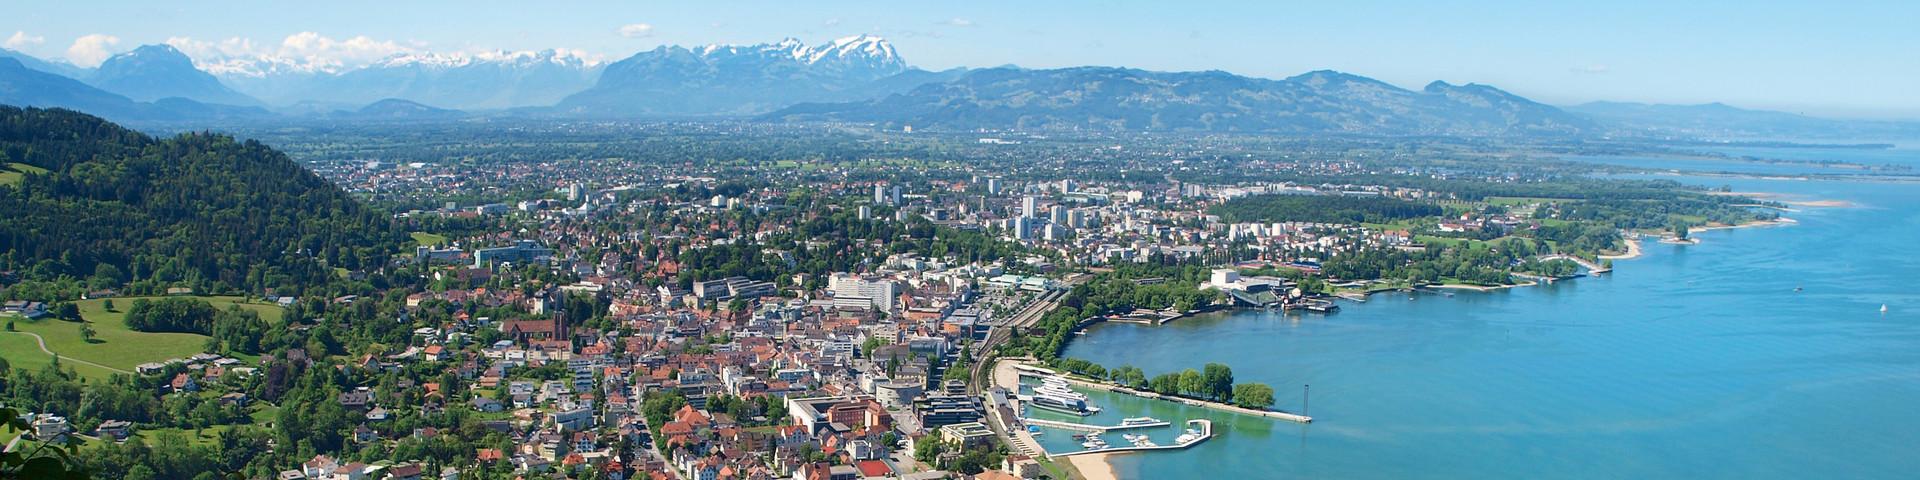 Bregenz Panorama © Curt Huber